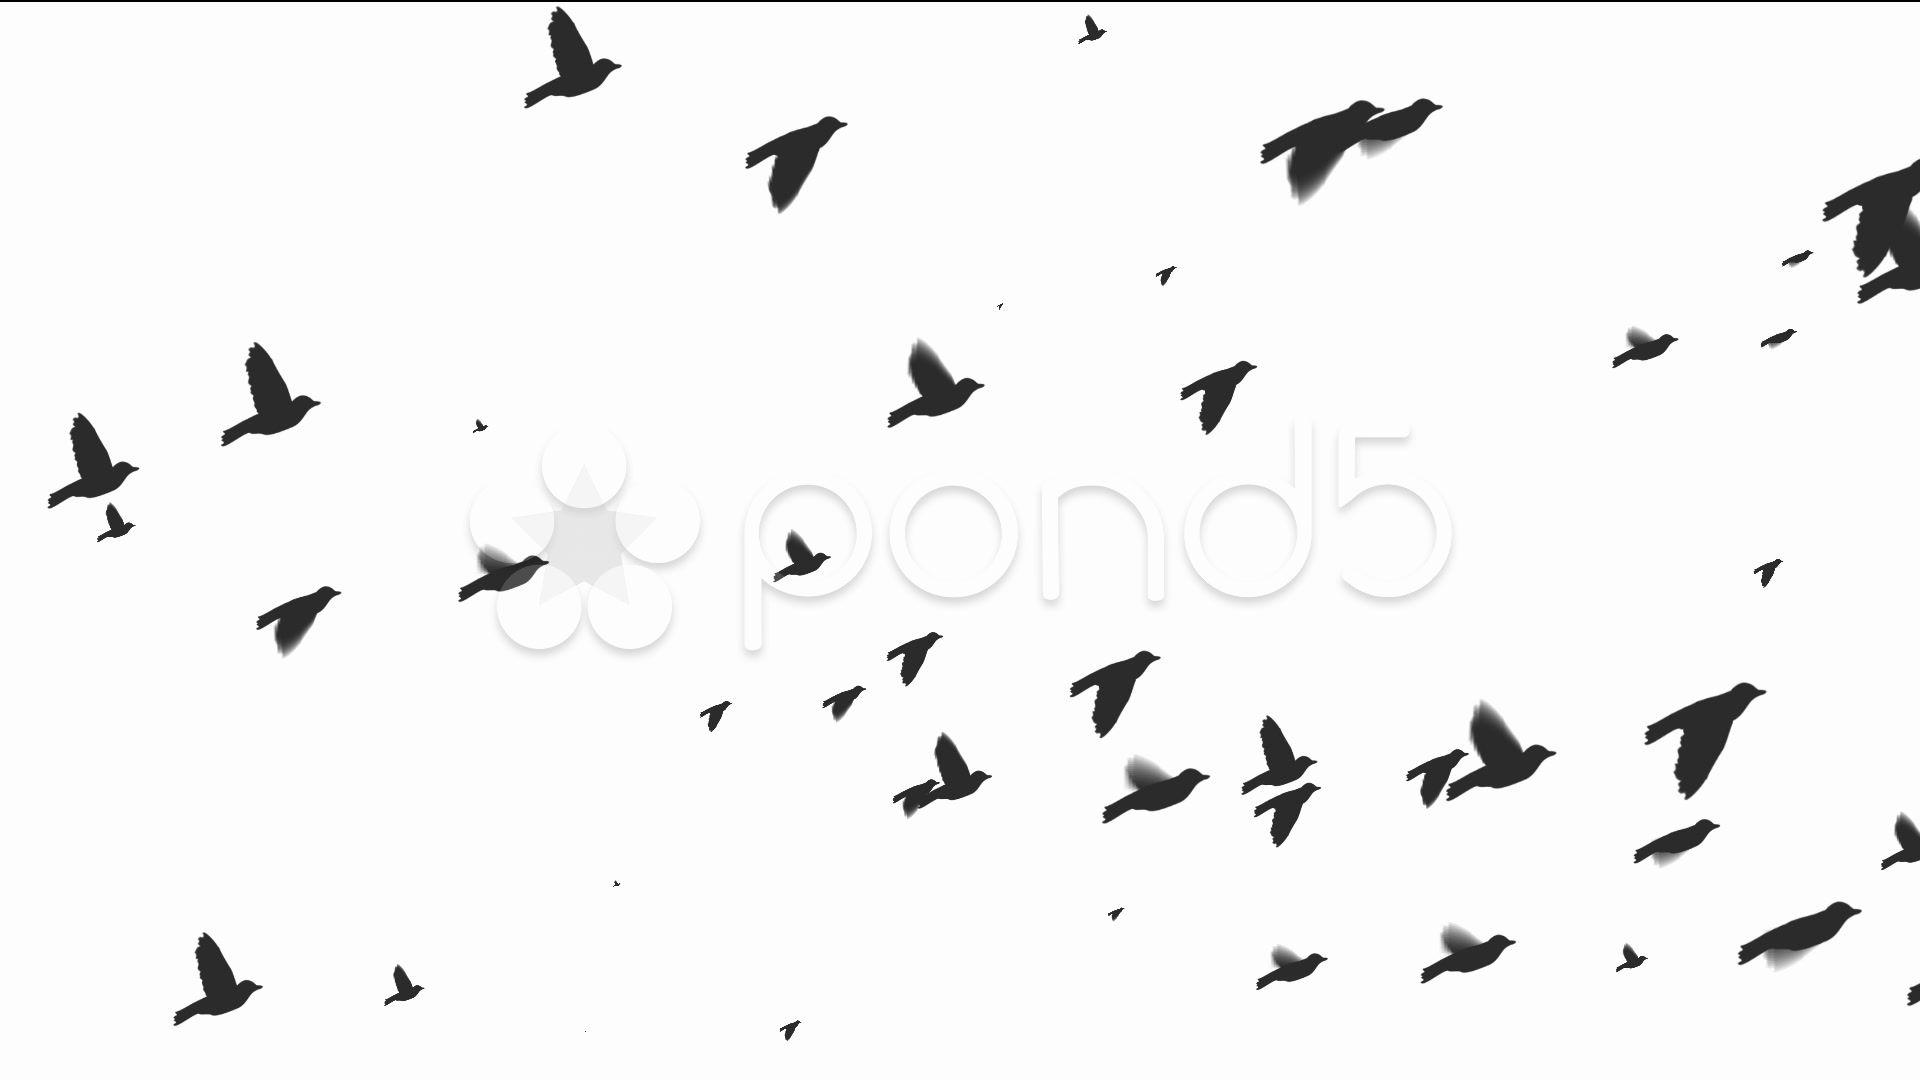 flying birds - Google Search